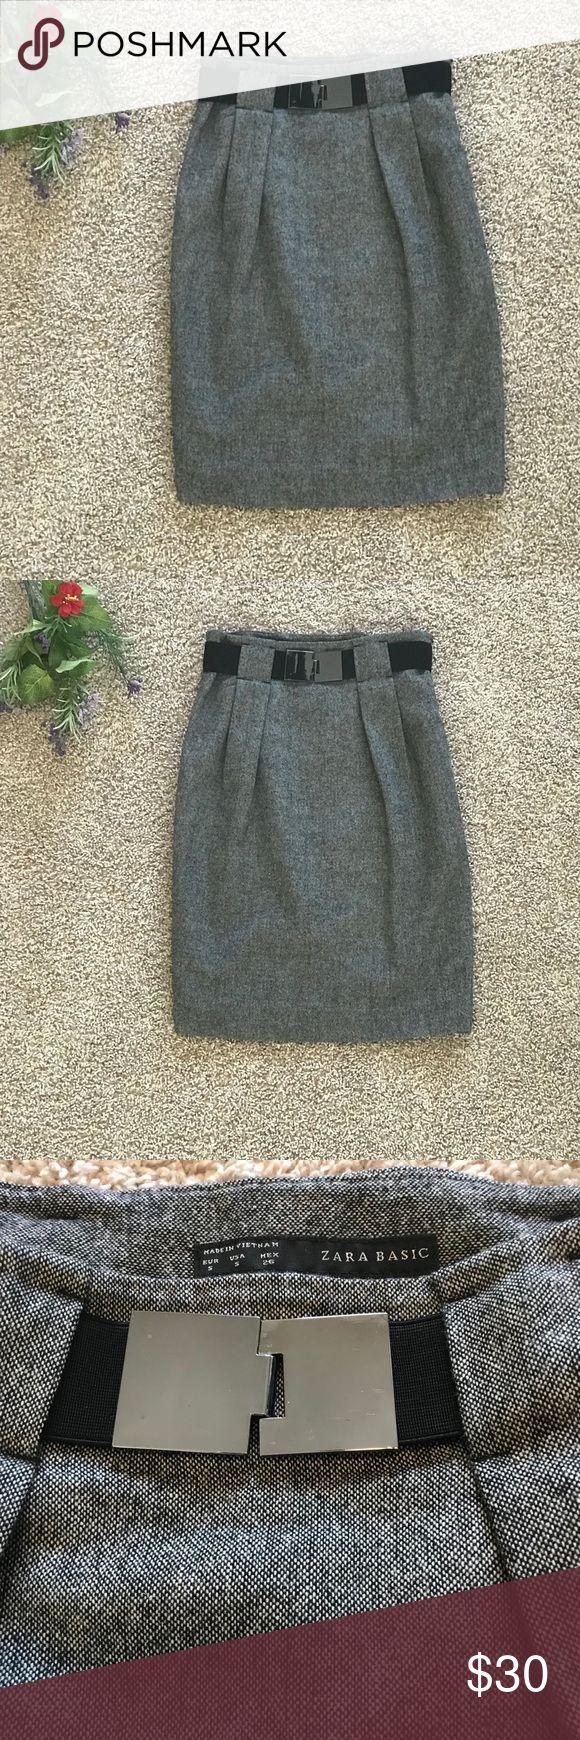 Zara Basic Grey Wool Skirt Size S Zara Basic Grey Wool Skirt. Size S. With Black Belt. In excellent Condition, only worn a few times. Zara Skirts